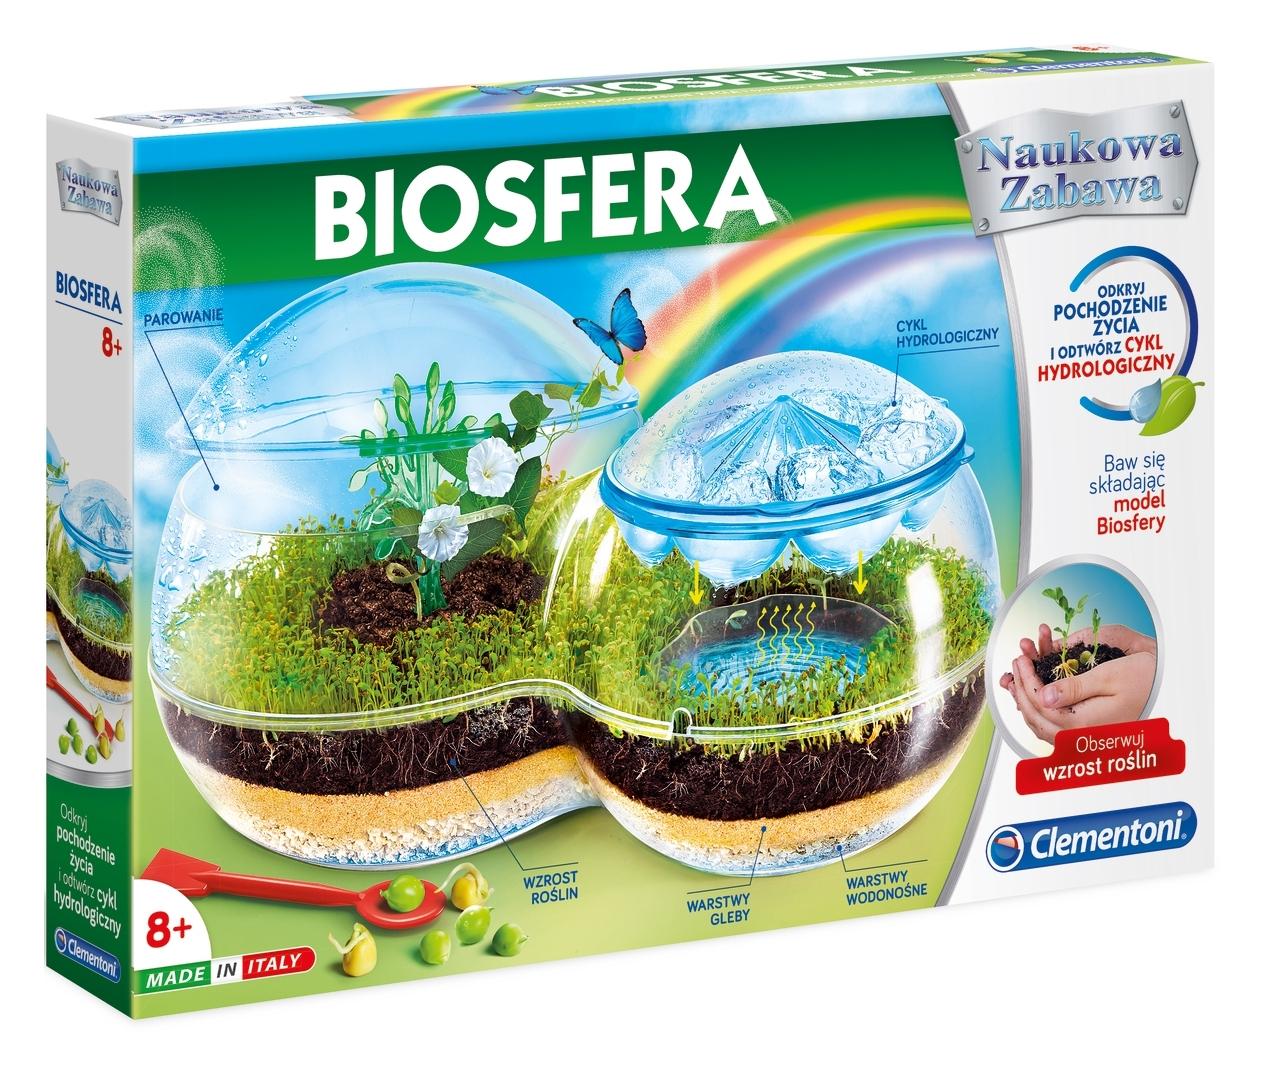 Naukowa Zabawa: Biosfera (50067)